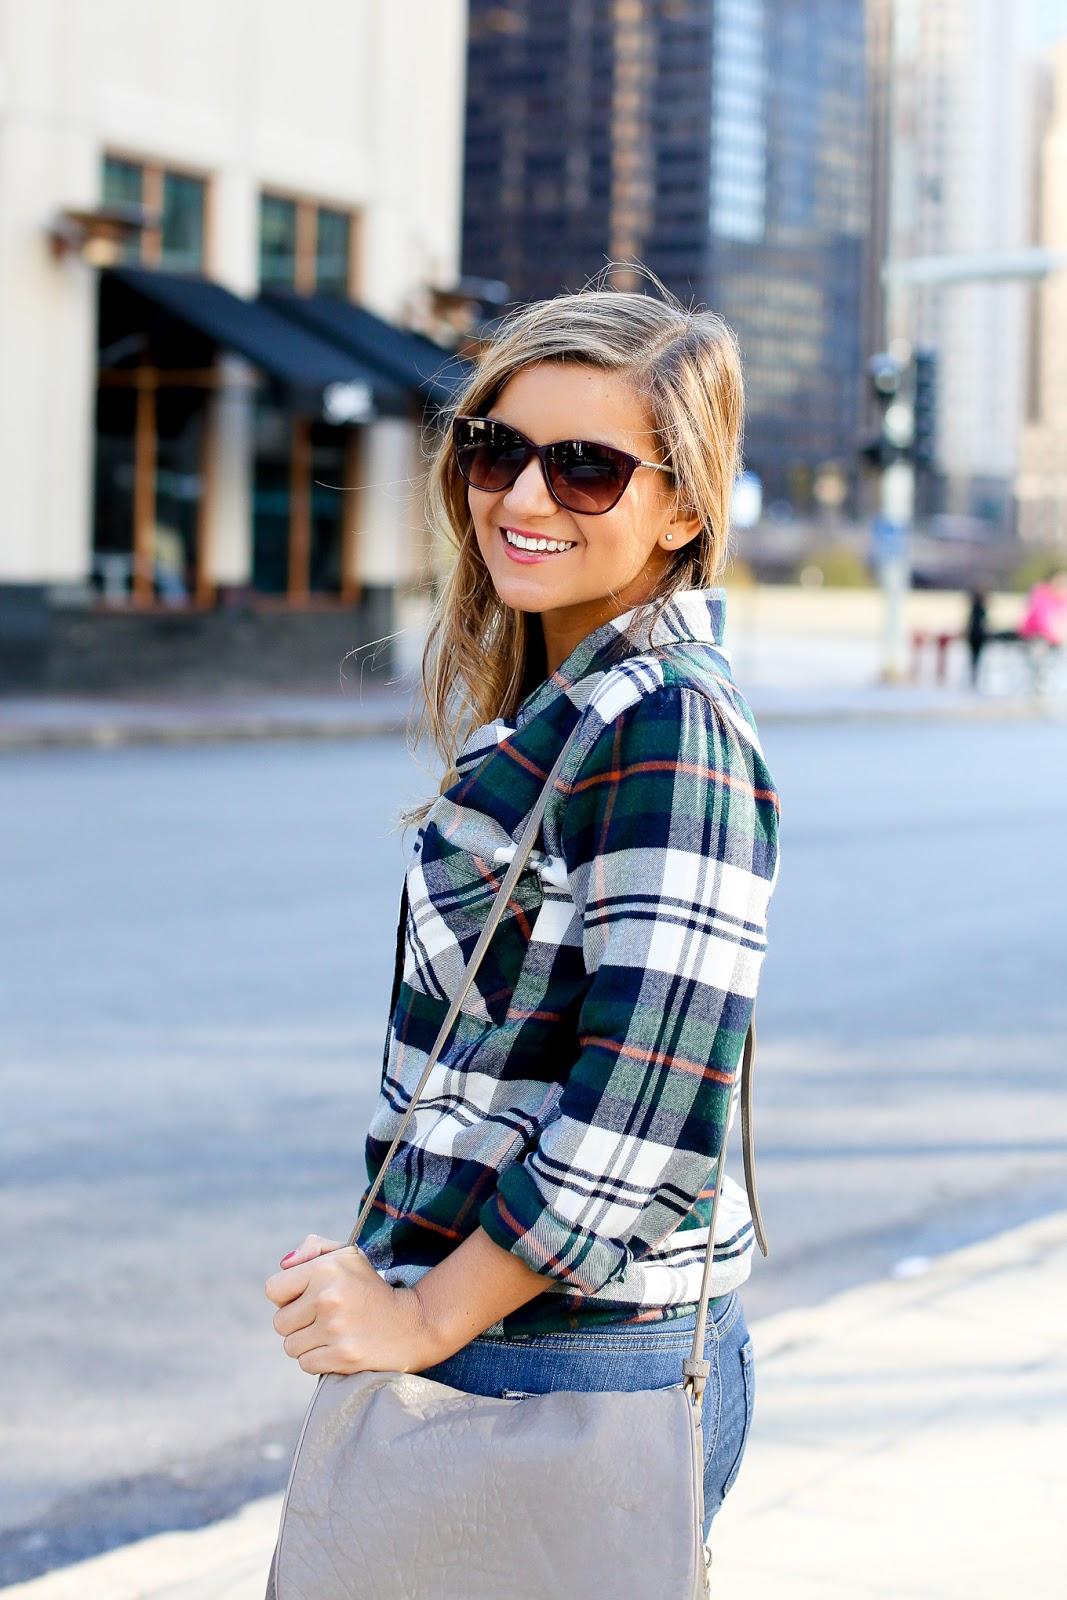 206df75cab7d Shirt: Rails | Sunglasses: Burburry c/o Endless Eyewear (use code  LAKESHORELADY for a free month) | Necklace: c/o Samantha Faye | Bag: Marc  by Marc Jacobs ...